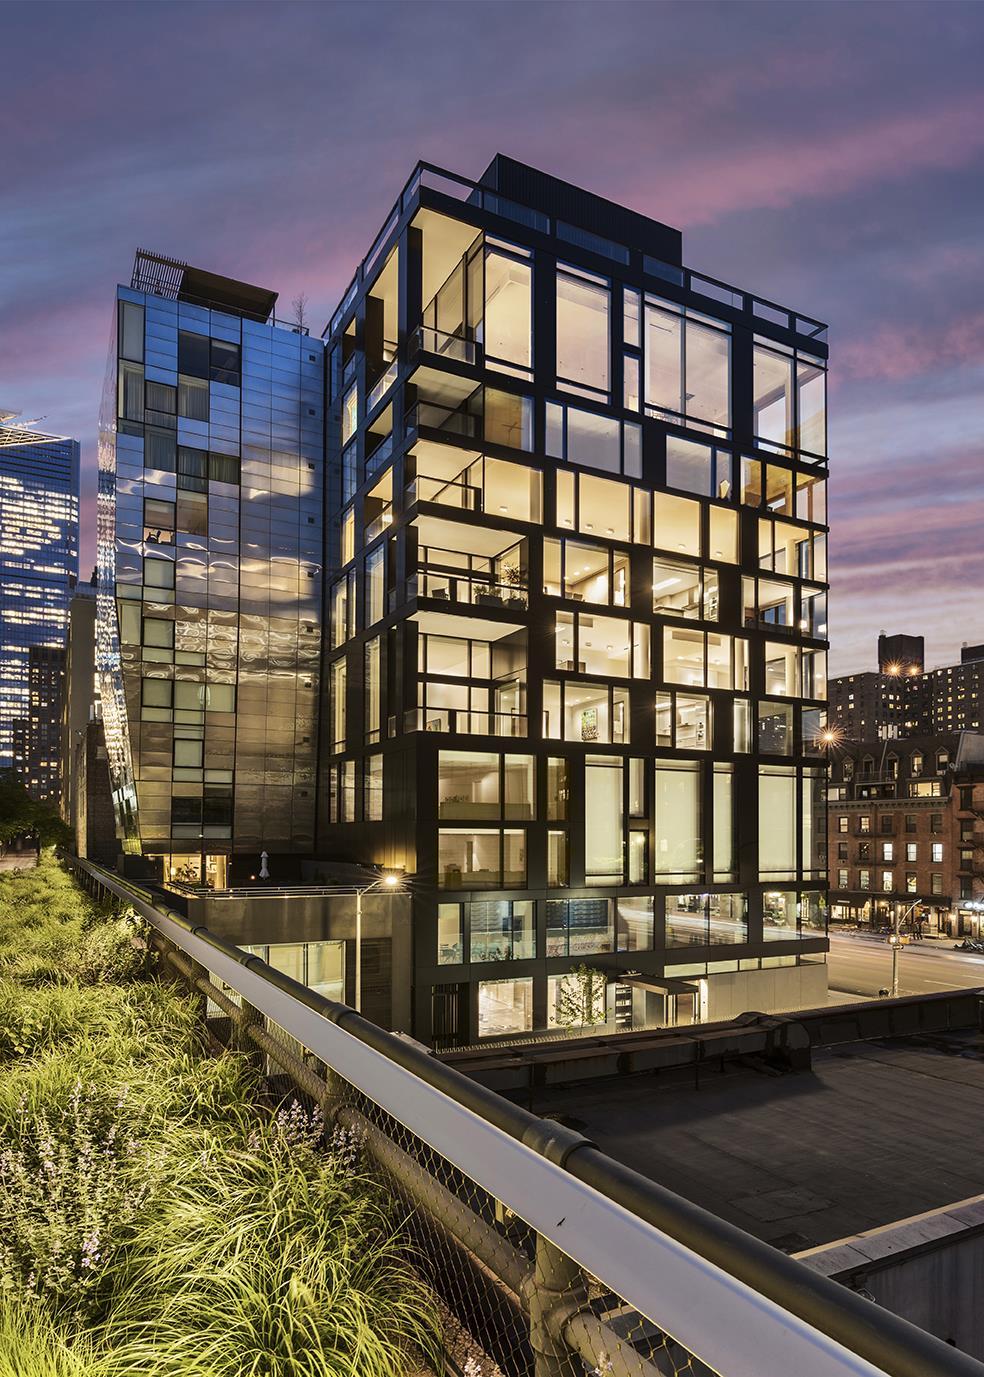 501 West 24th Street Chelsea New York NY 10001